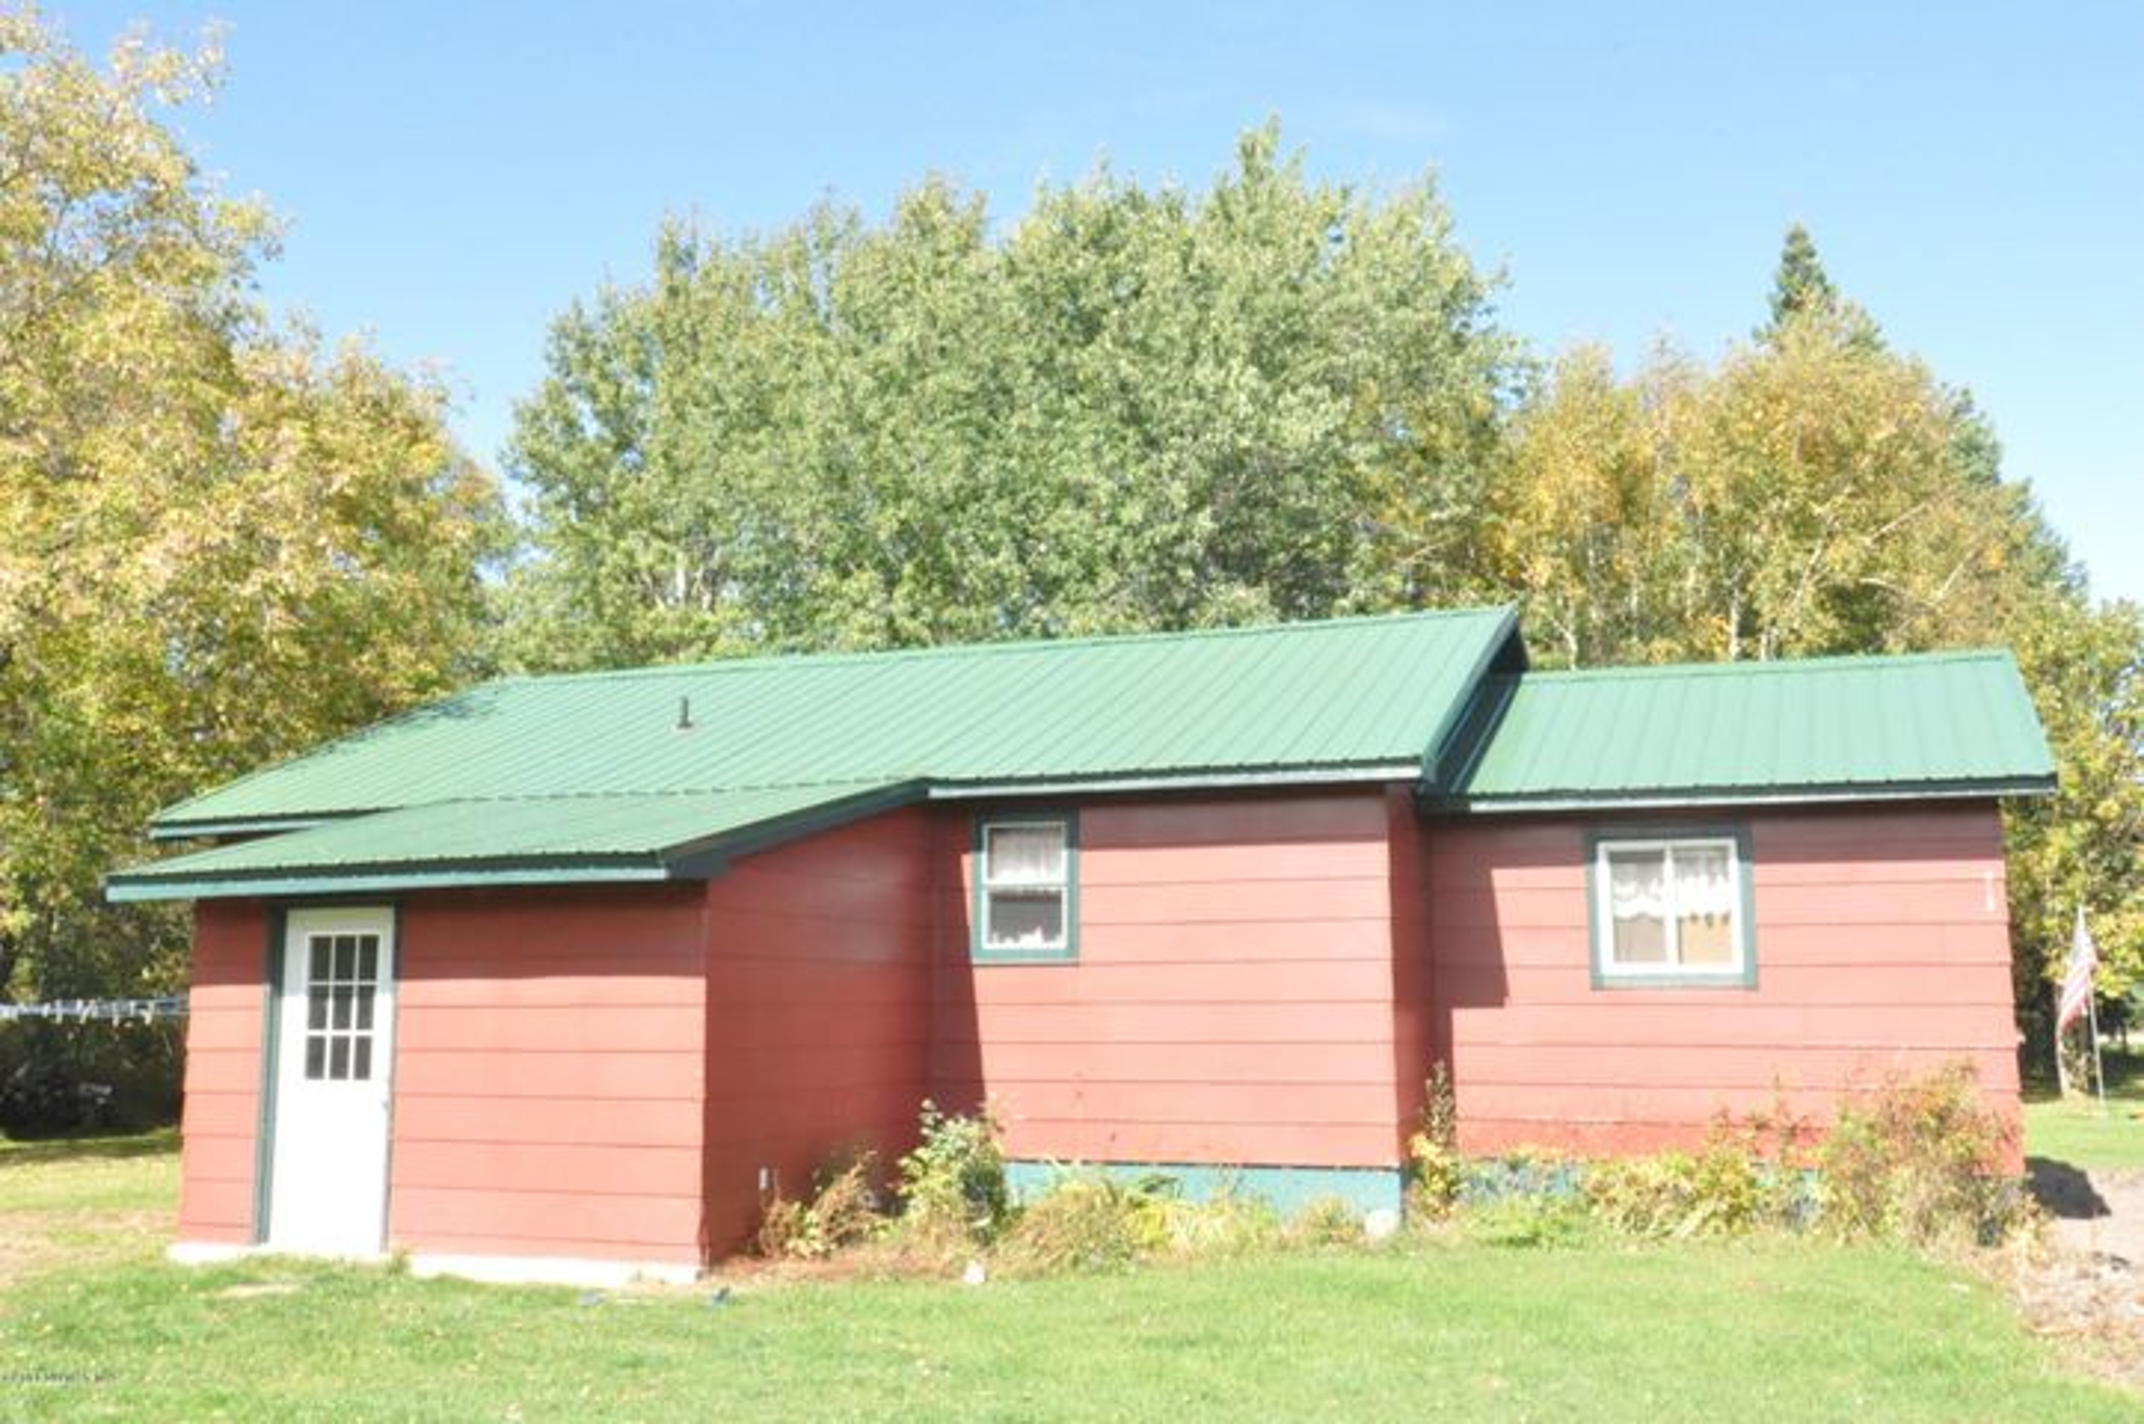 43926 County 18 Road, Wannaska, MN 56761